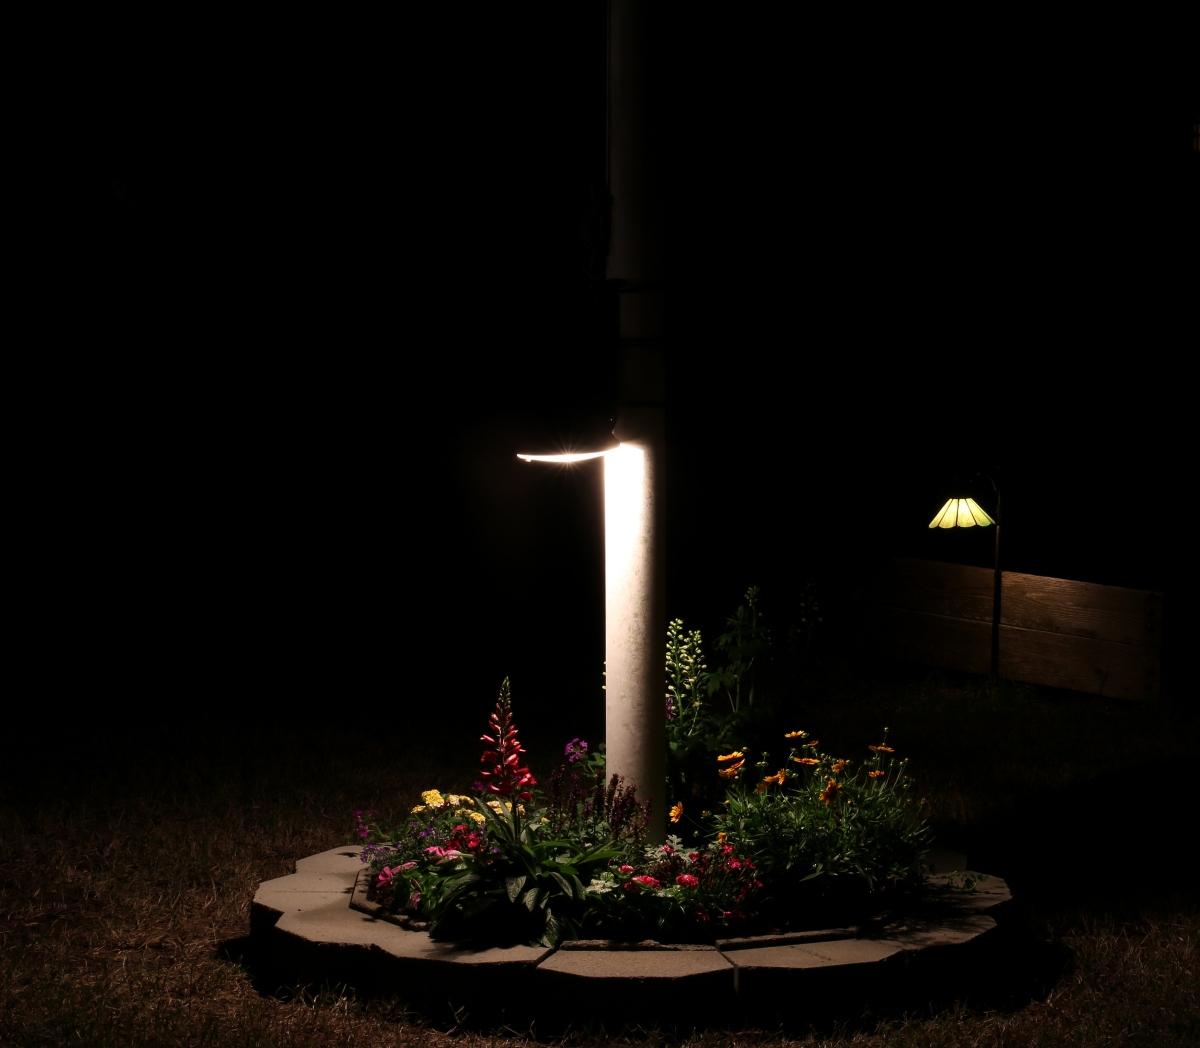 DIY [# 23] ~ Landscape–Flagpole Light,06/02